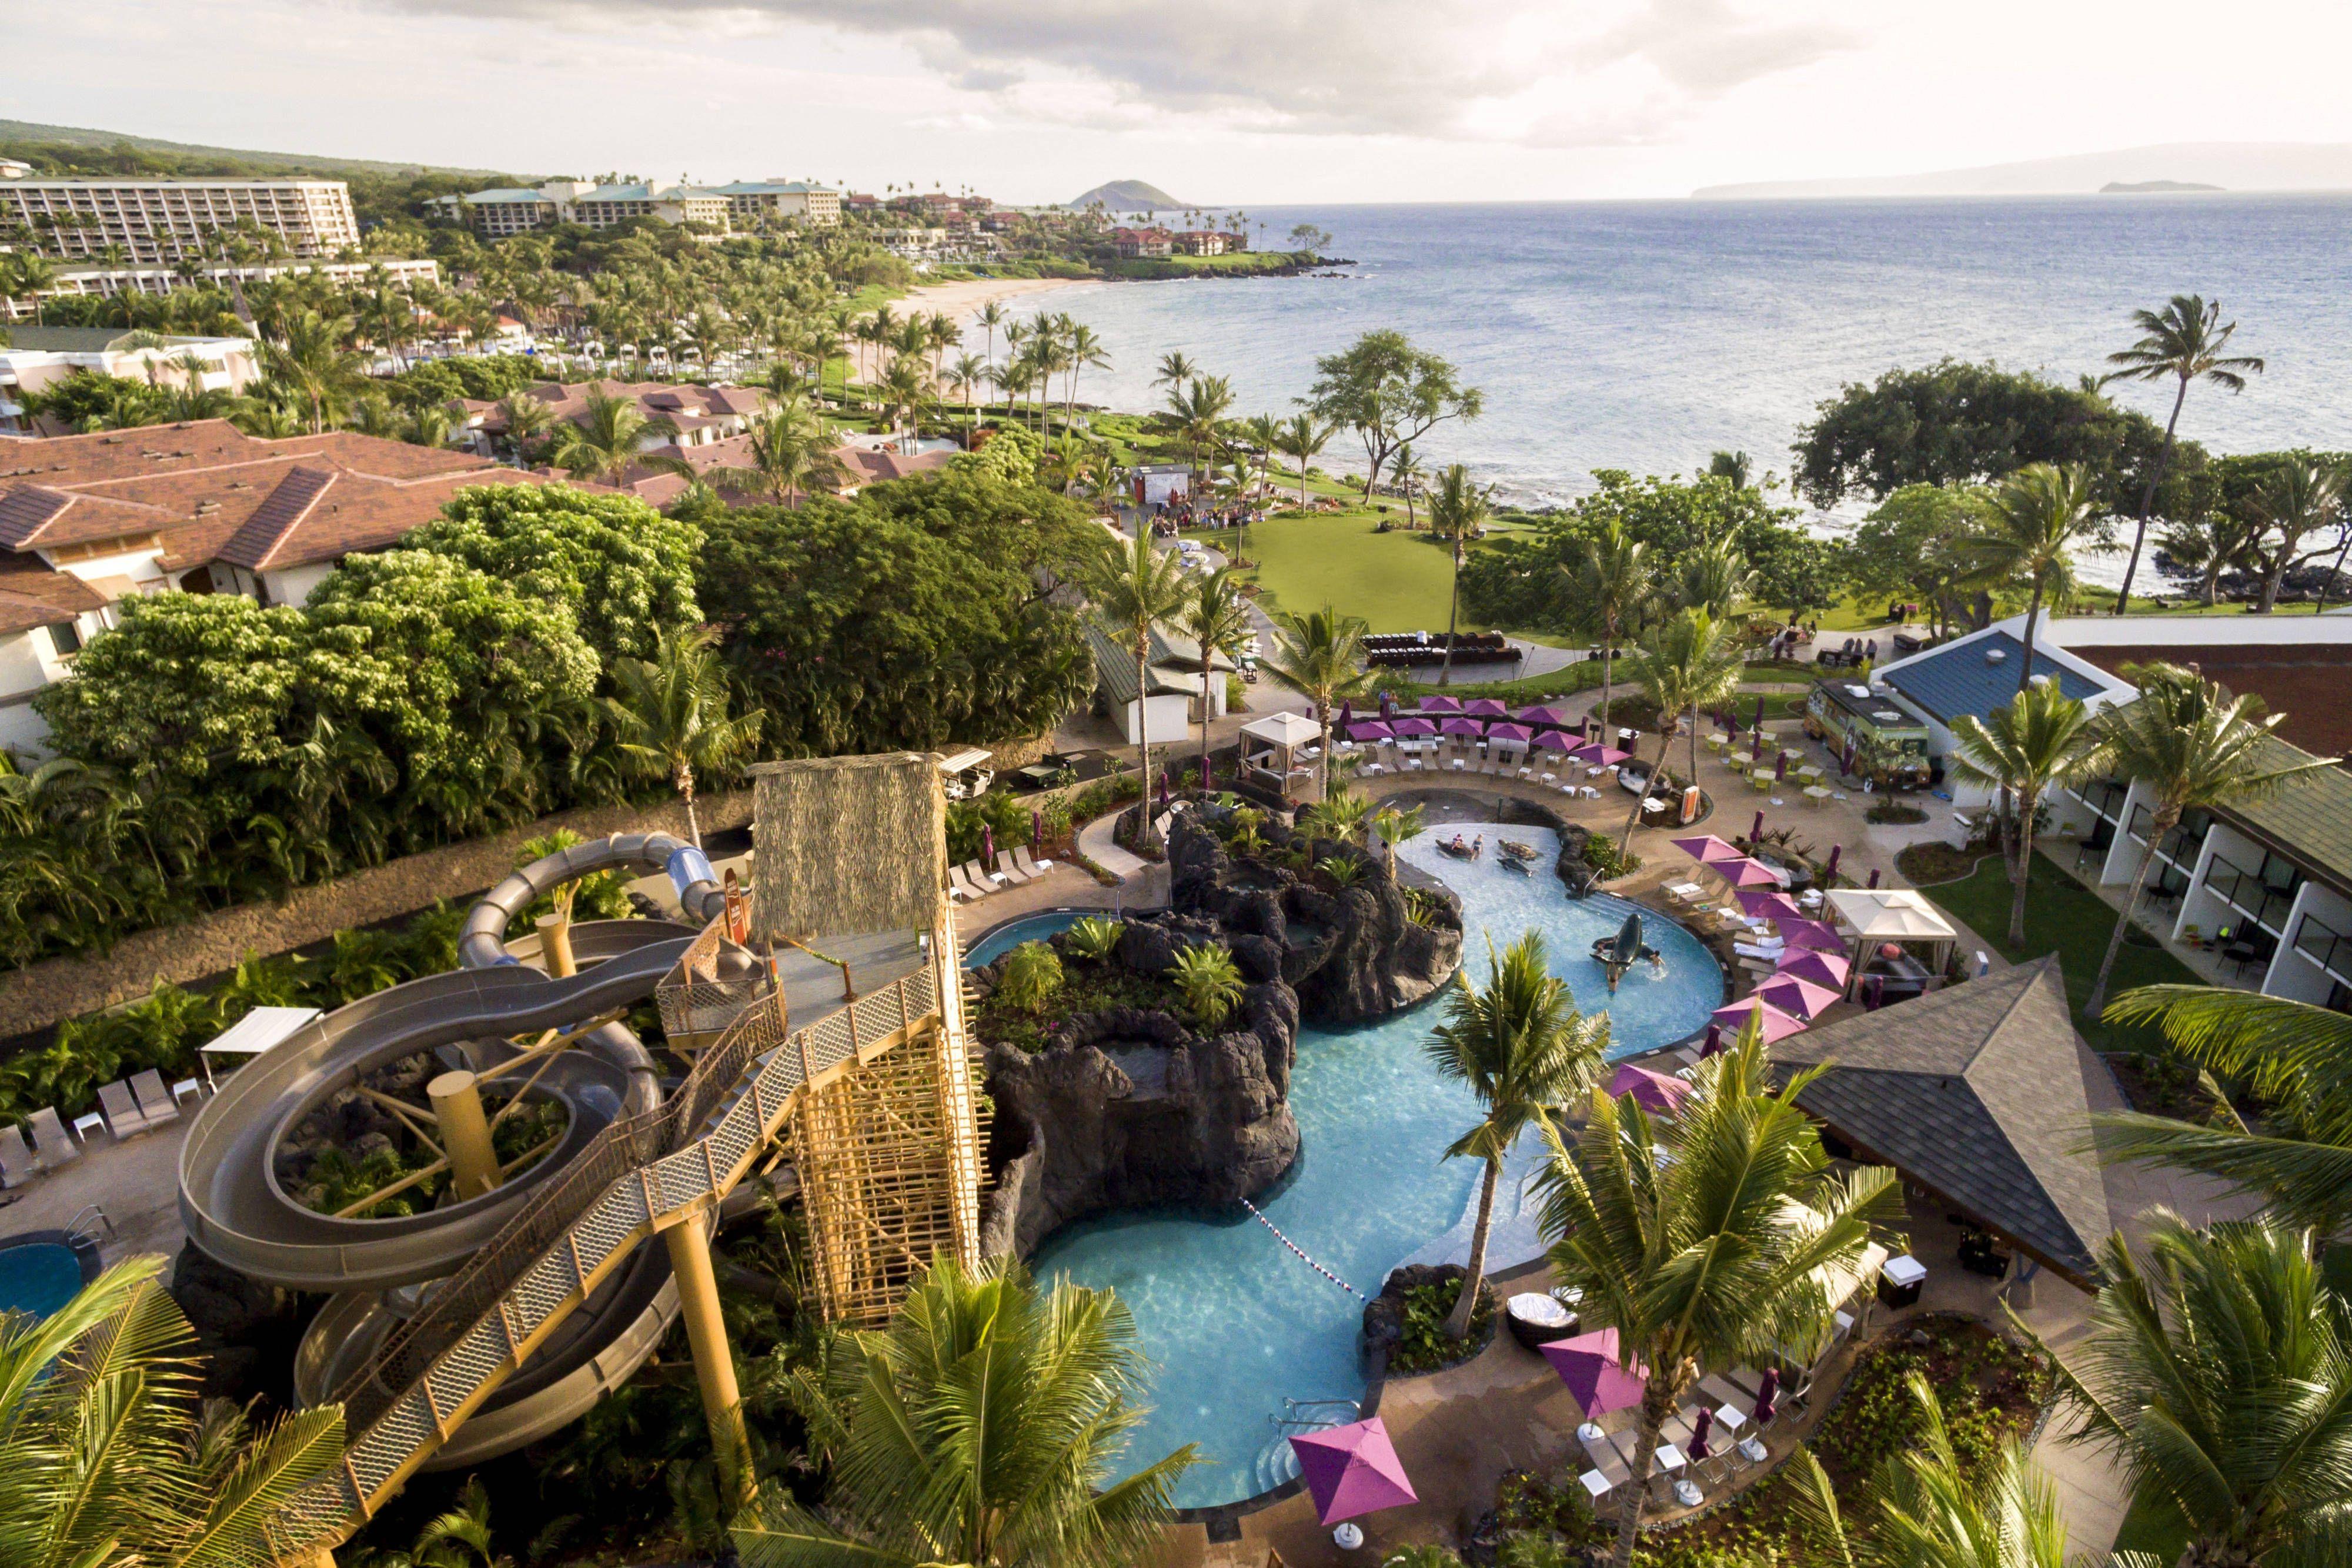 Wailea Beach Resort Marriott Maui Nalu Adventure Pool